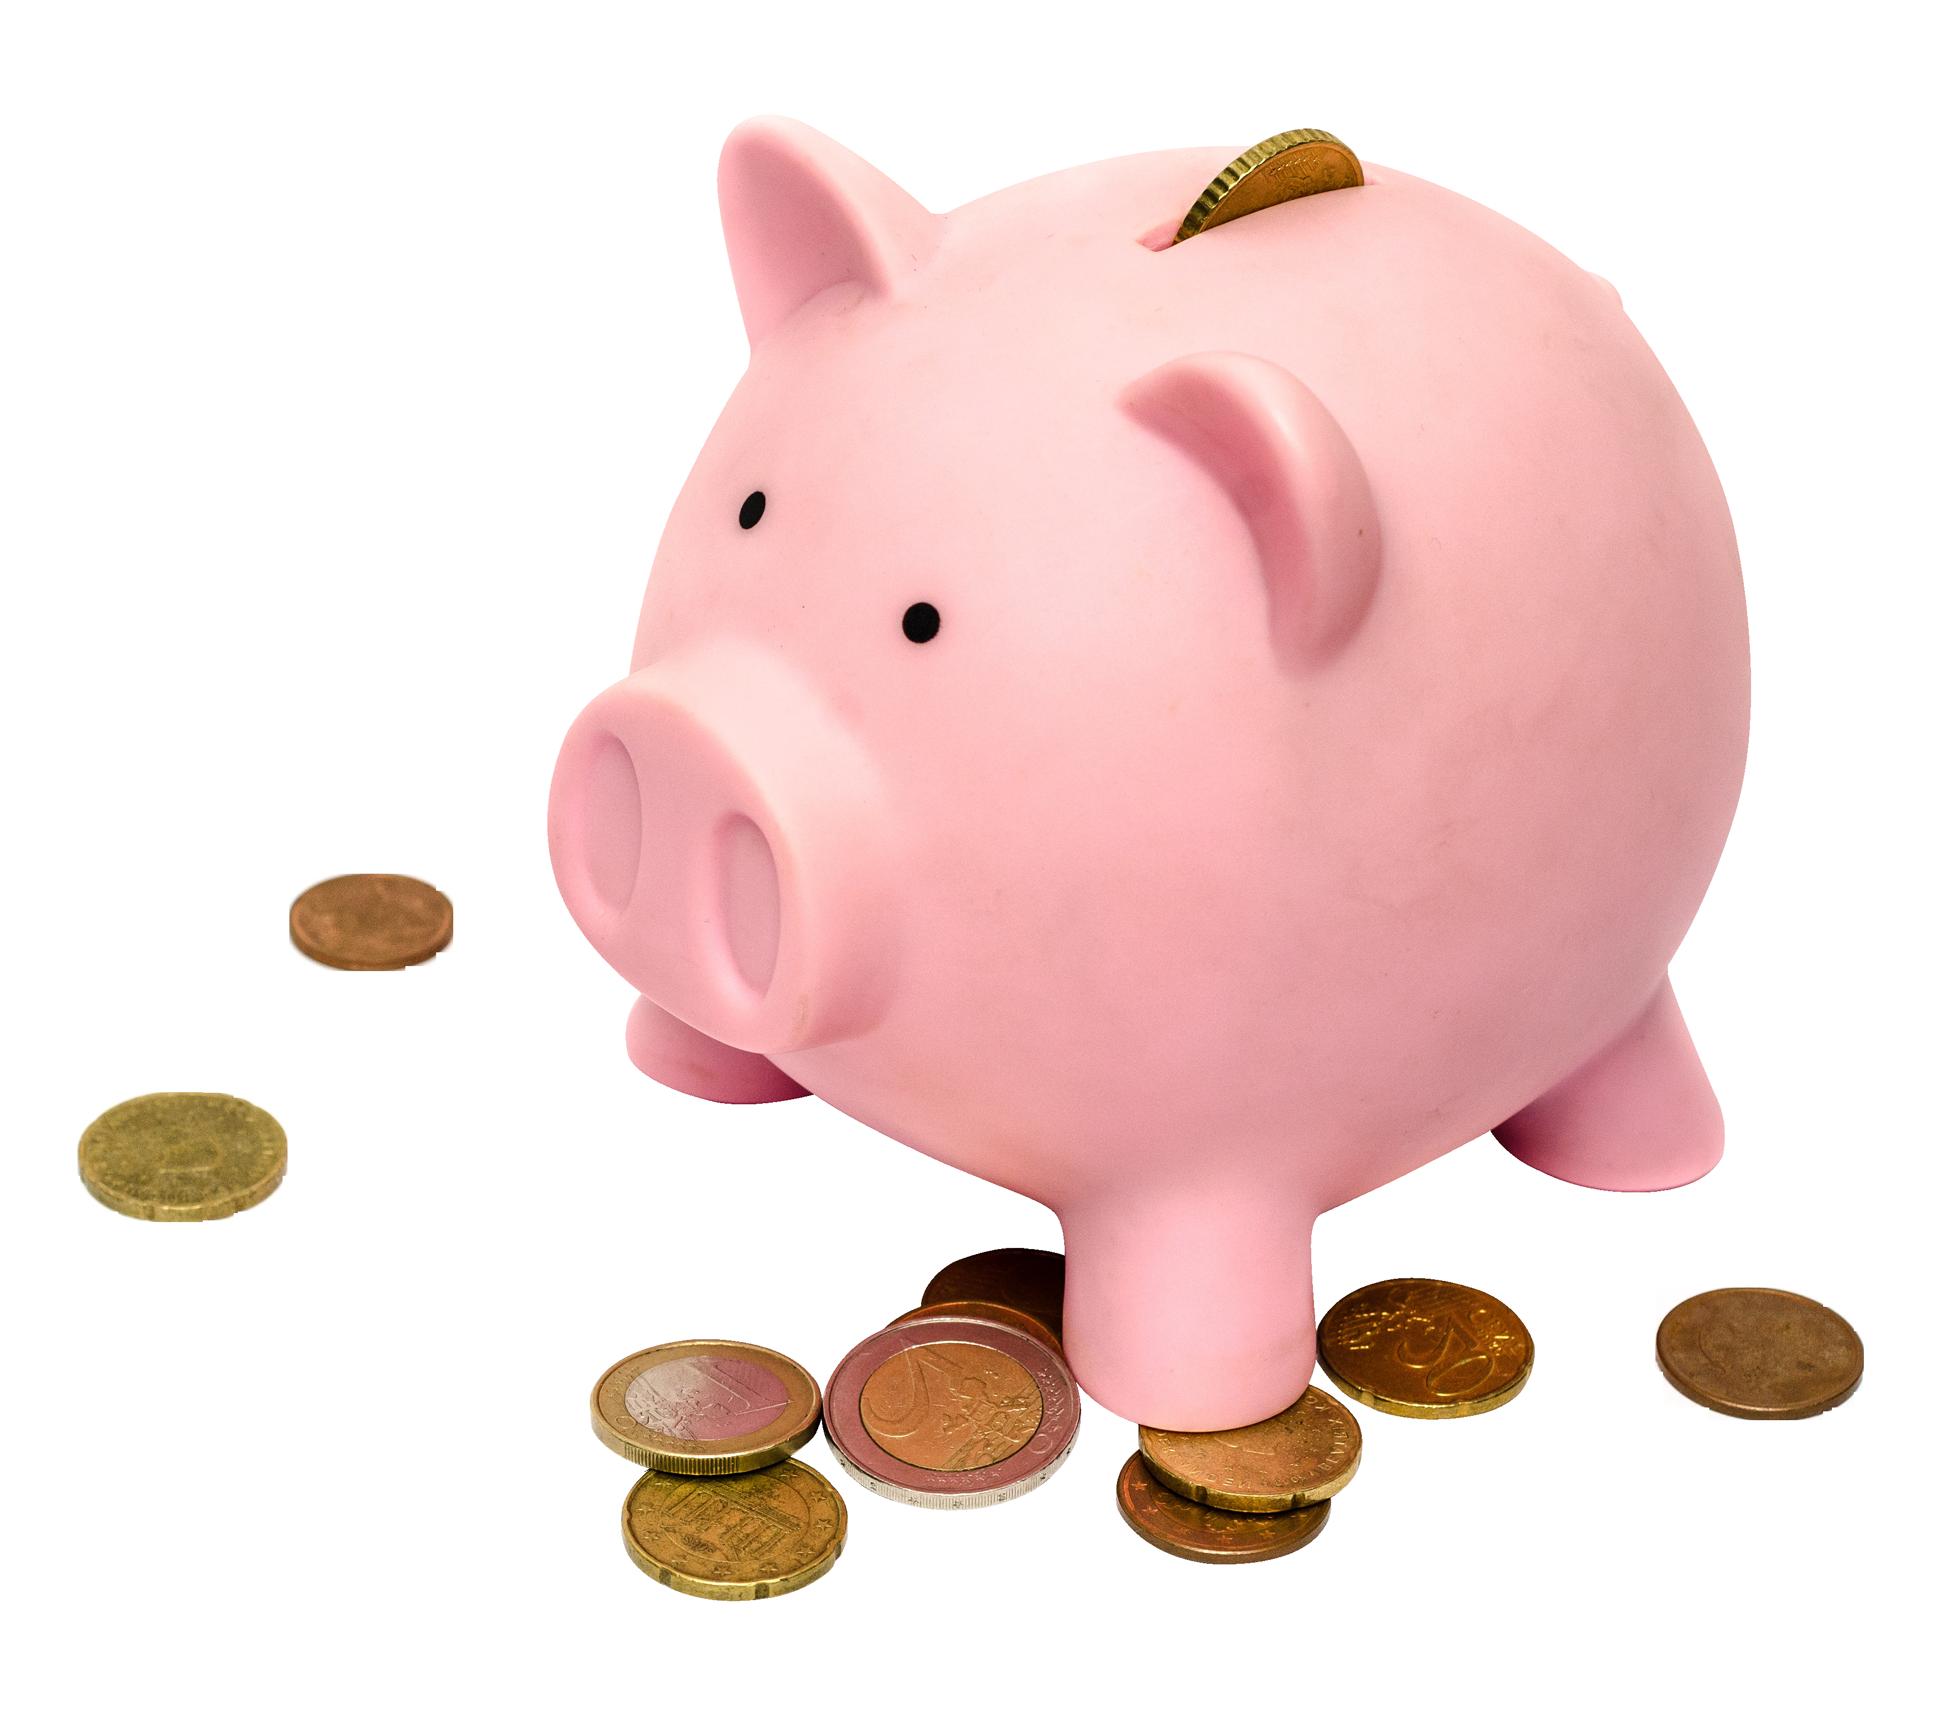 Piggy Bank PNG Image.